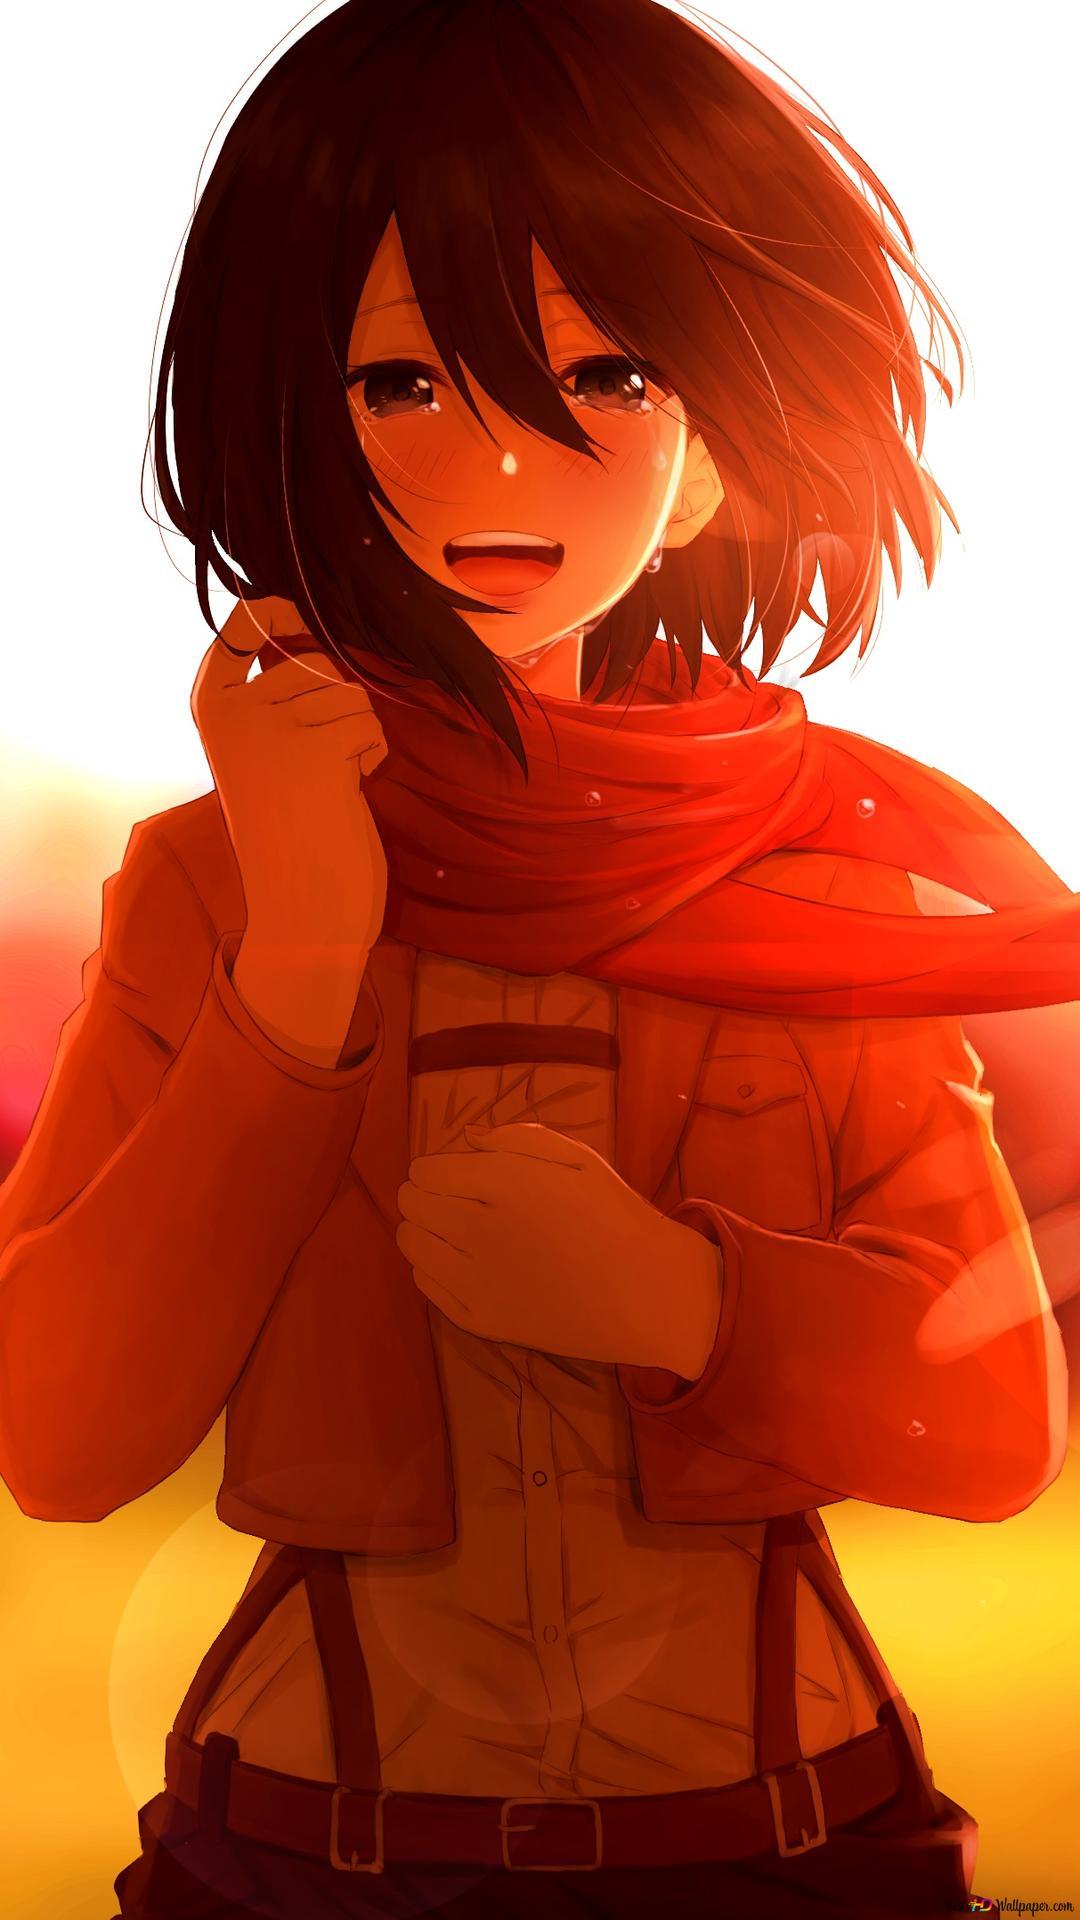 Mikasa Hd Wallpaper Download